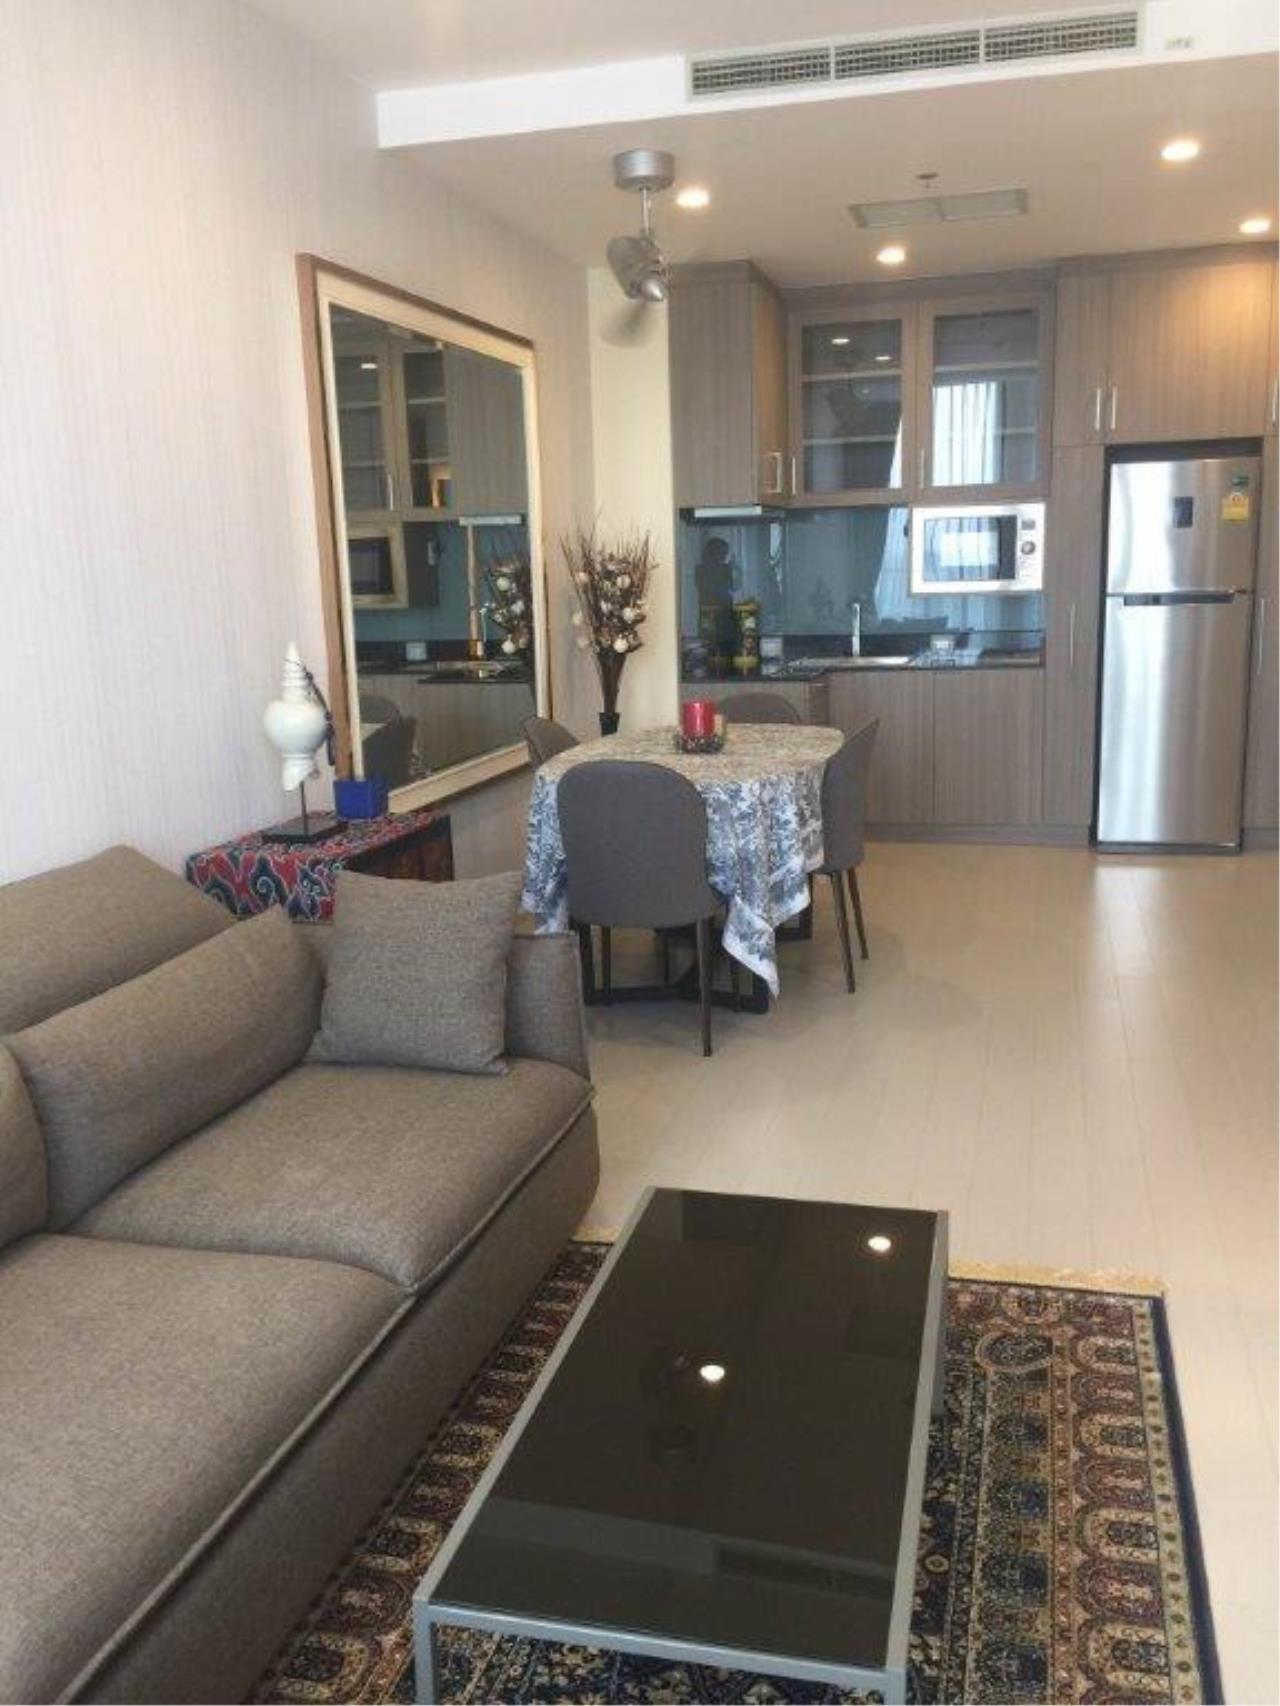 Century21 Skylux Agency's Noble Ploenchit / Condo For Rent / 1 Bedroom / 58.9 SQM / BTS Phloen Chit / Bangkok 1